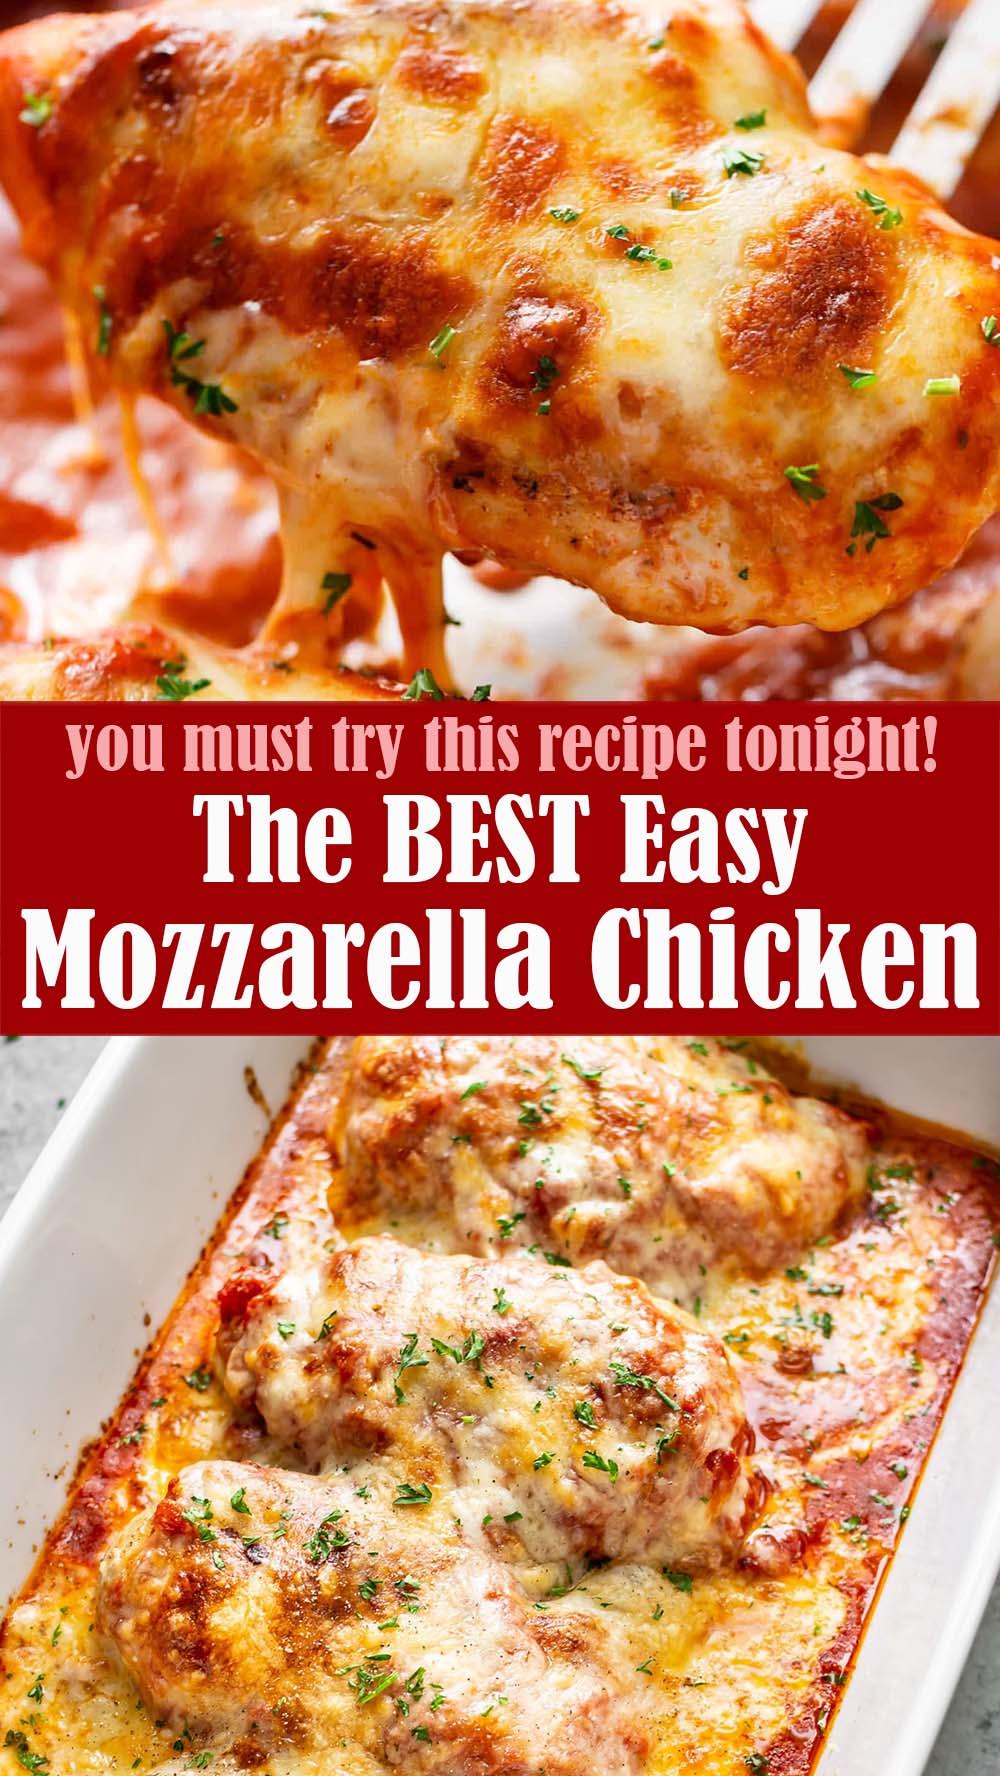 Easy Mozzarella Chicken Recipe